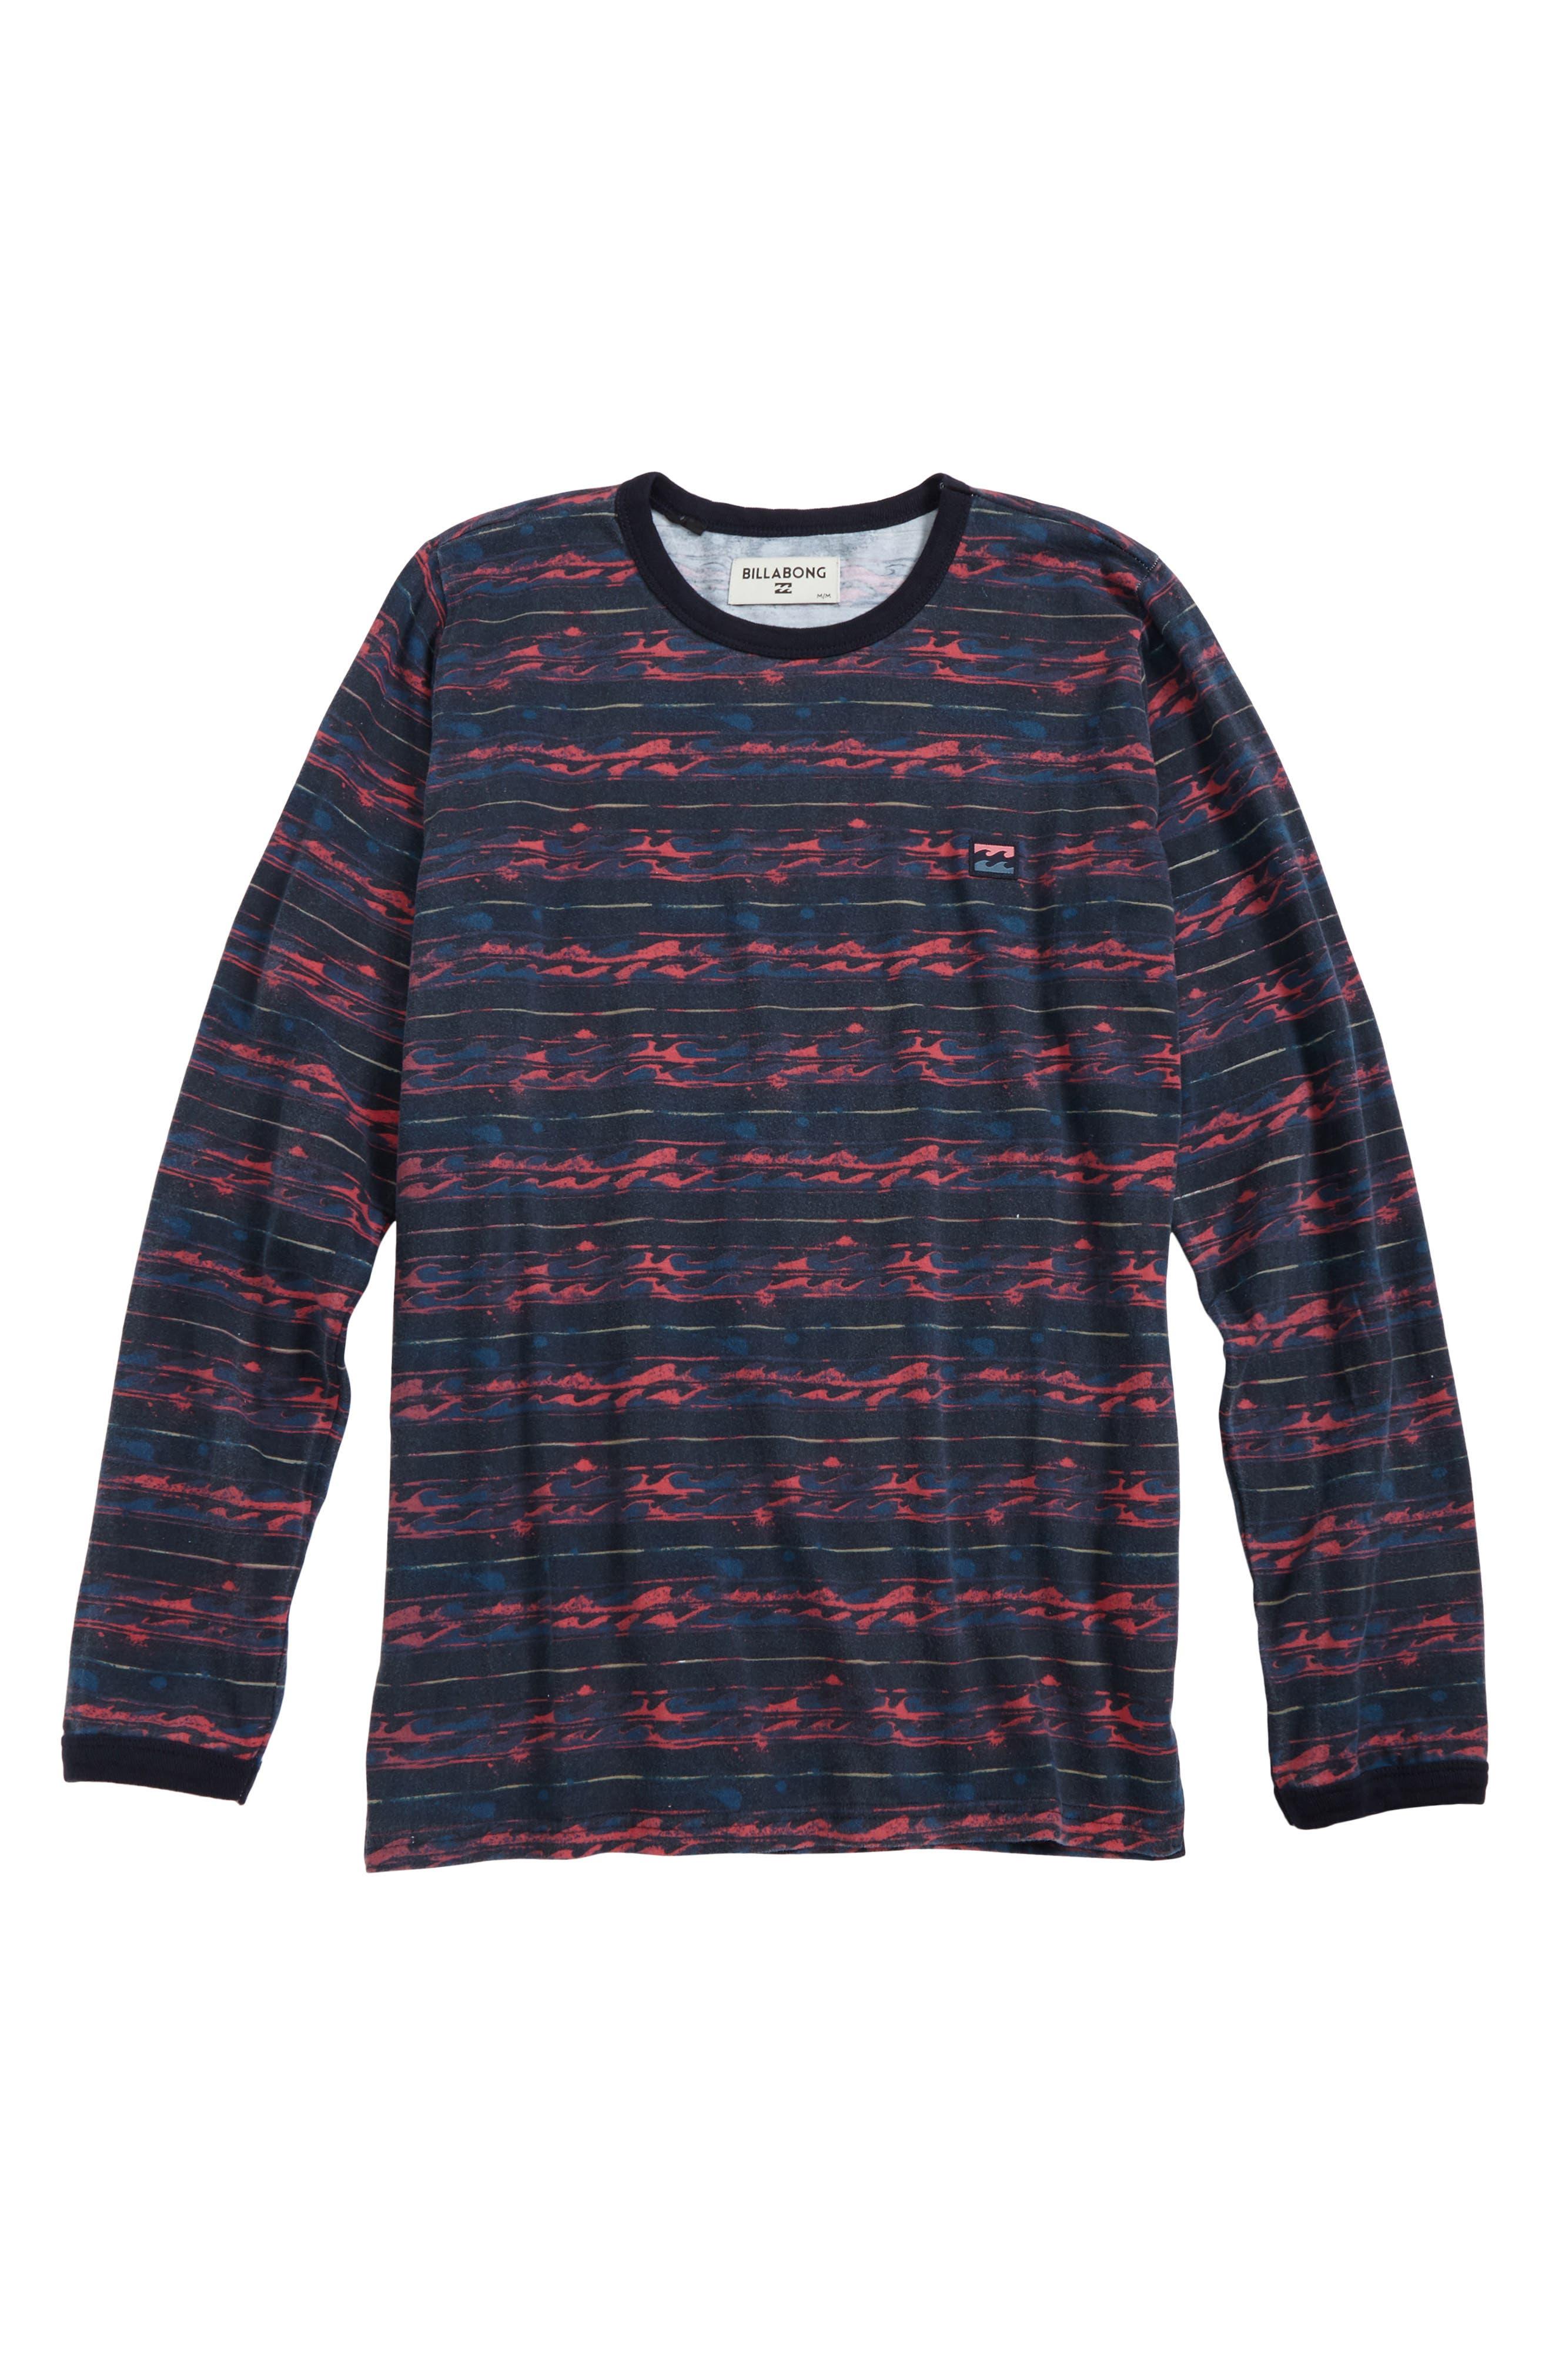 Nelson T-Shirt,                             Main thumbnail 1, color,                             Navy